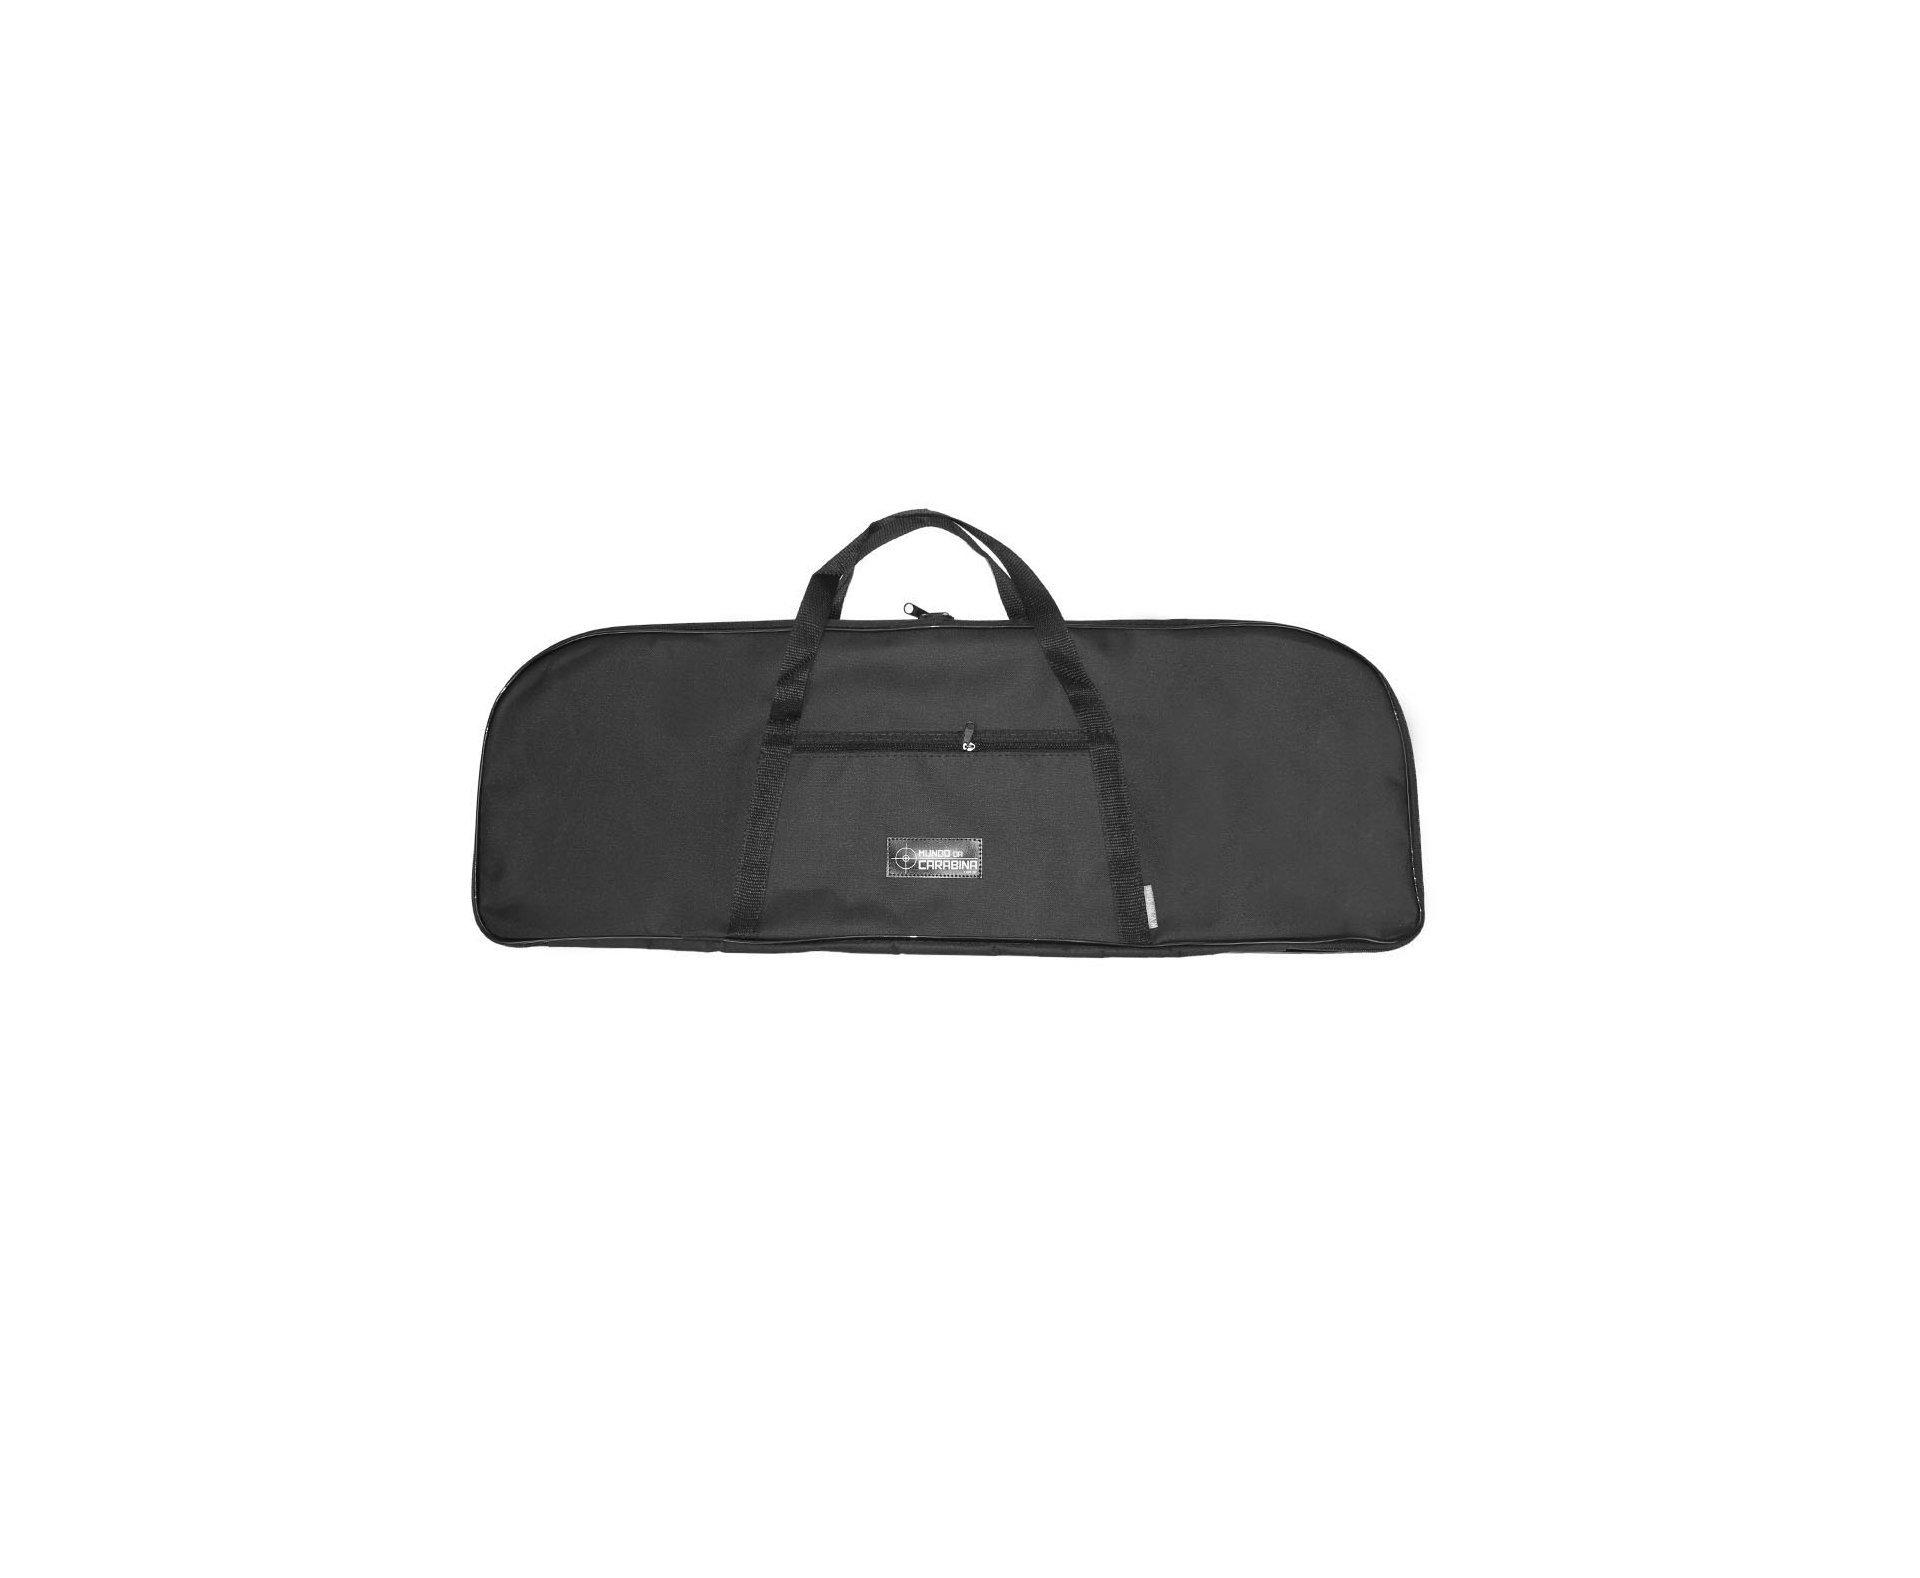 Capa Para Airsoft Preta Simples 0,32 X 0, 90 - Mundo Da Carabina